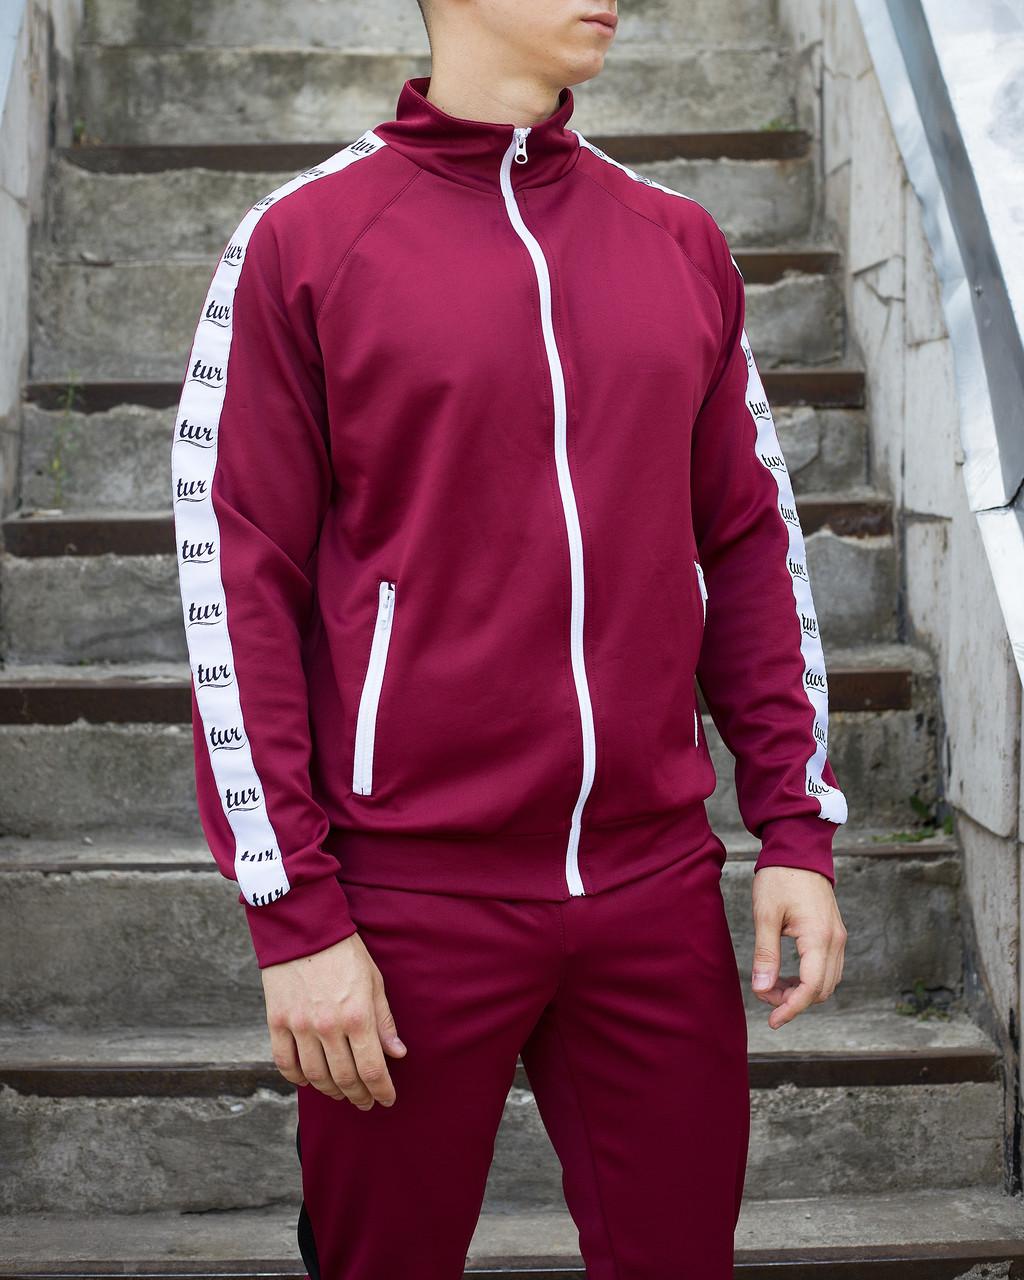 Мастерка олимпийка мужская бордовая бренд ТУР модель Смоук (Smoke) размер XS, S, M, L, XL